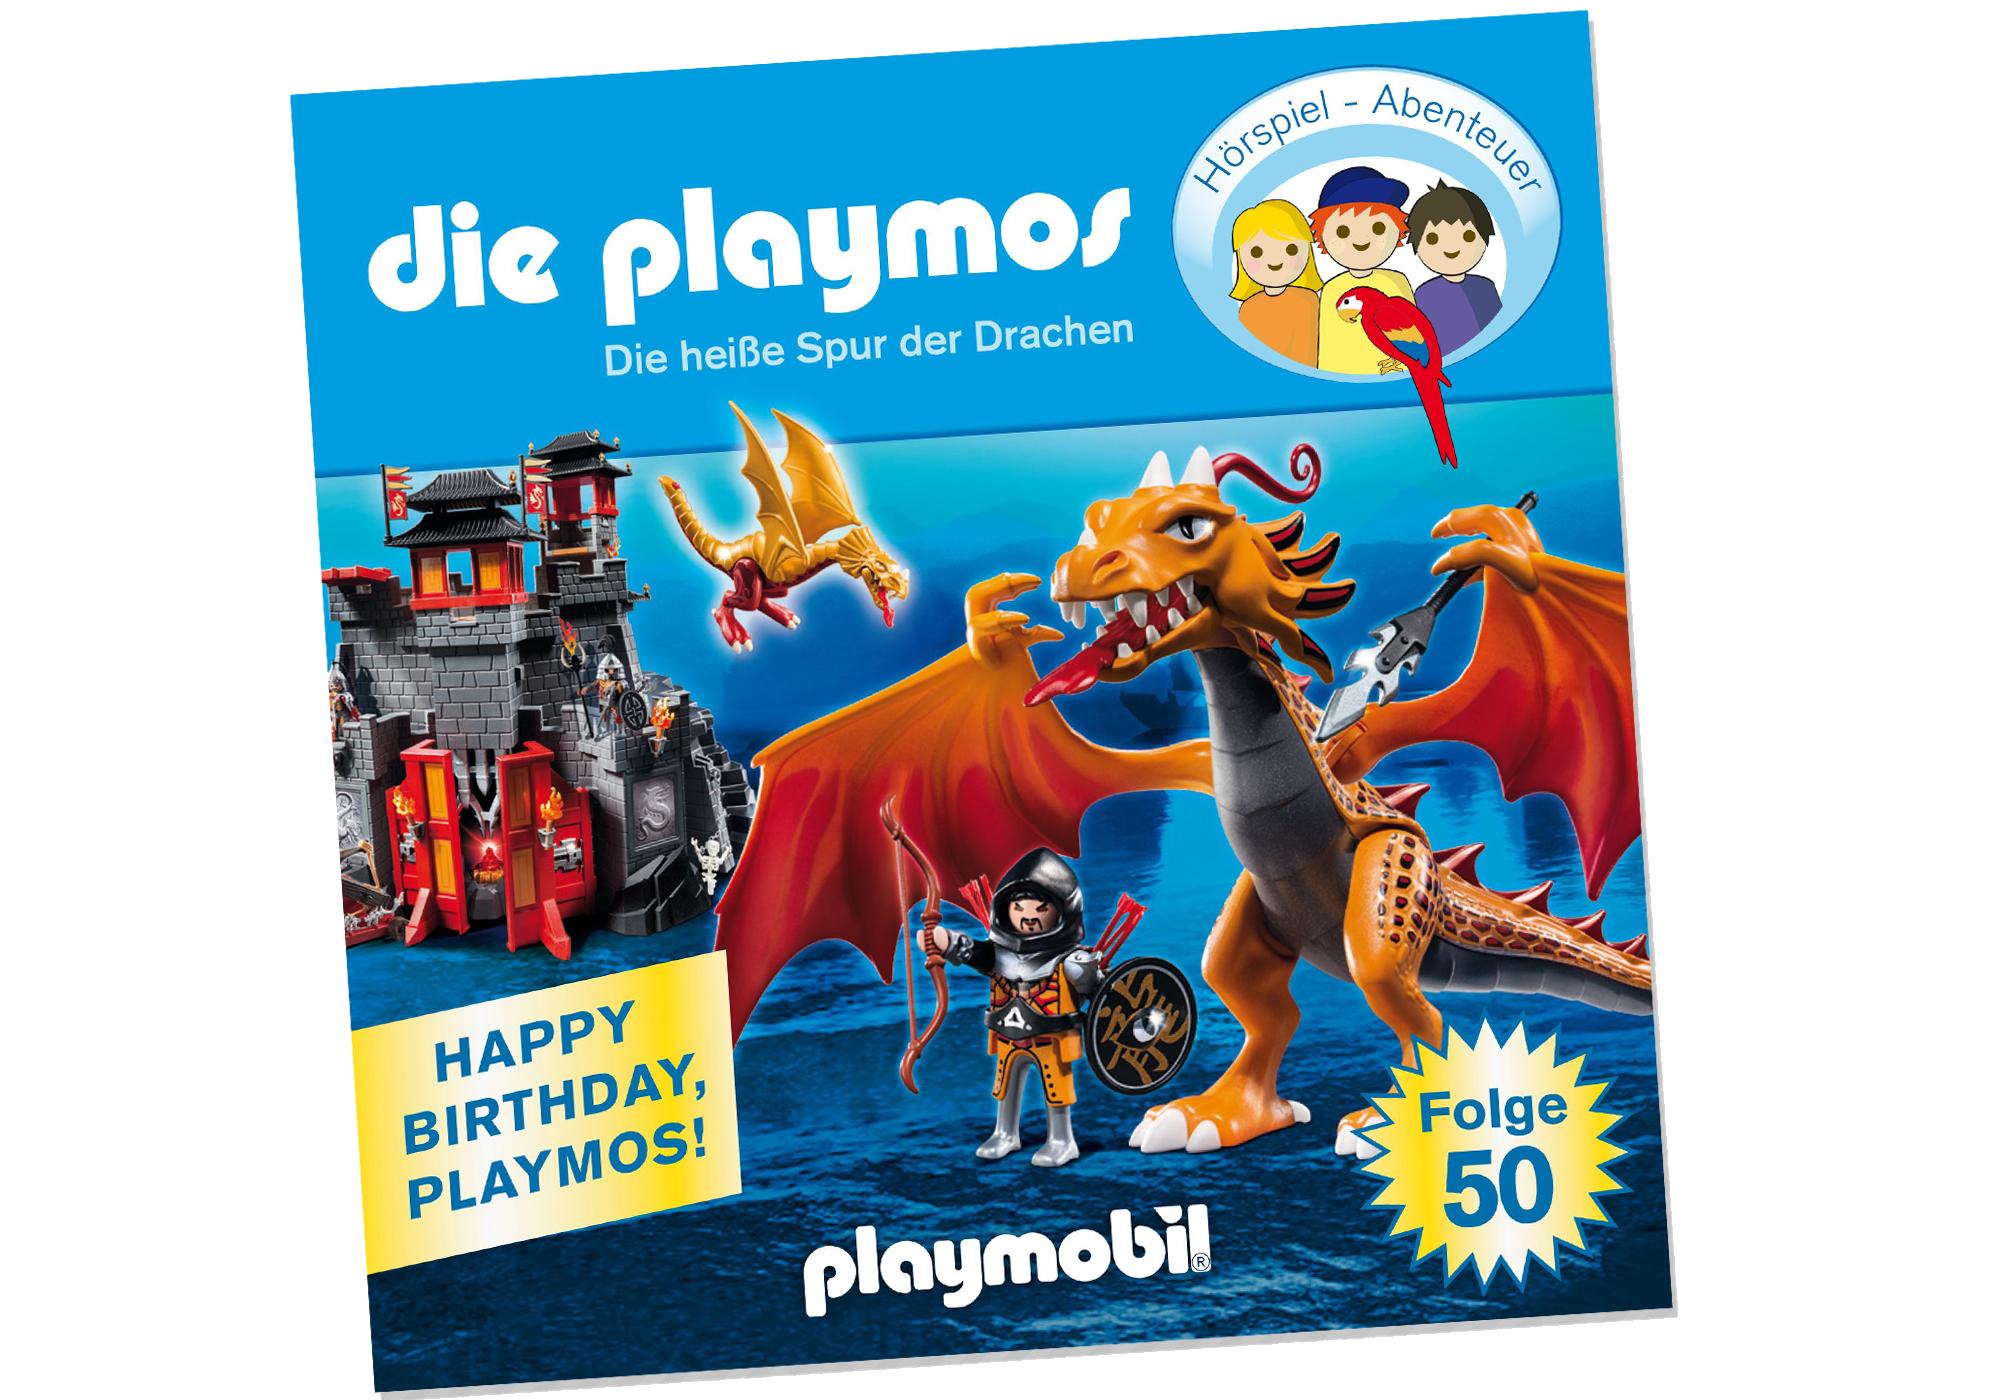 http://media.playmobil.com/i/playmobil/80257_product_detail/Die heiße Spur der Drachen - Folge 50